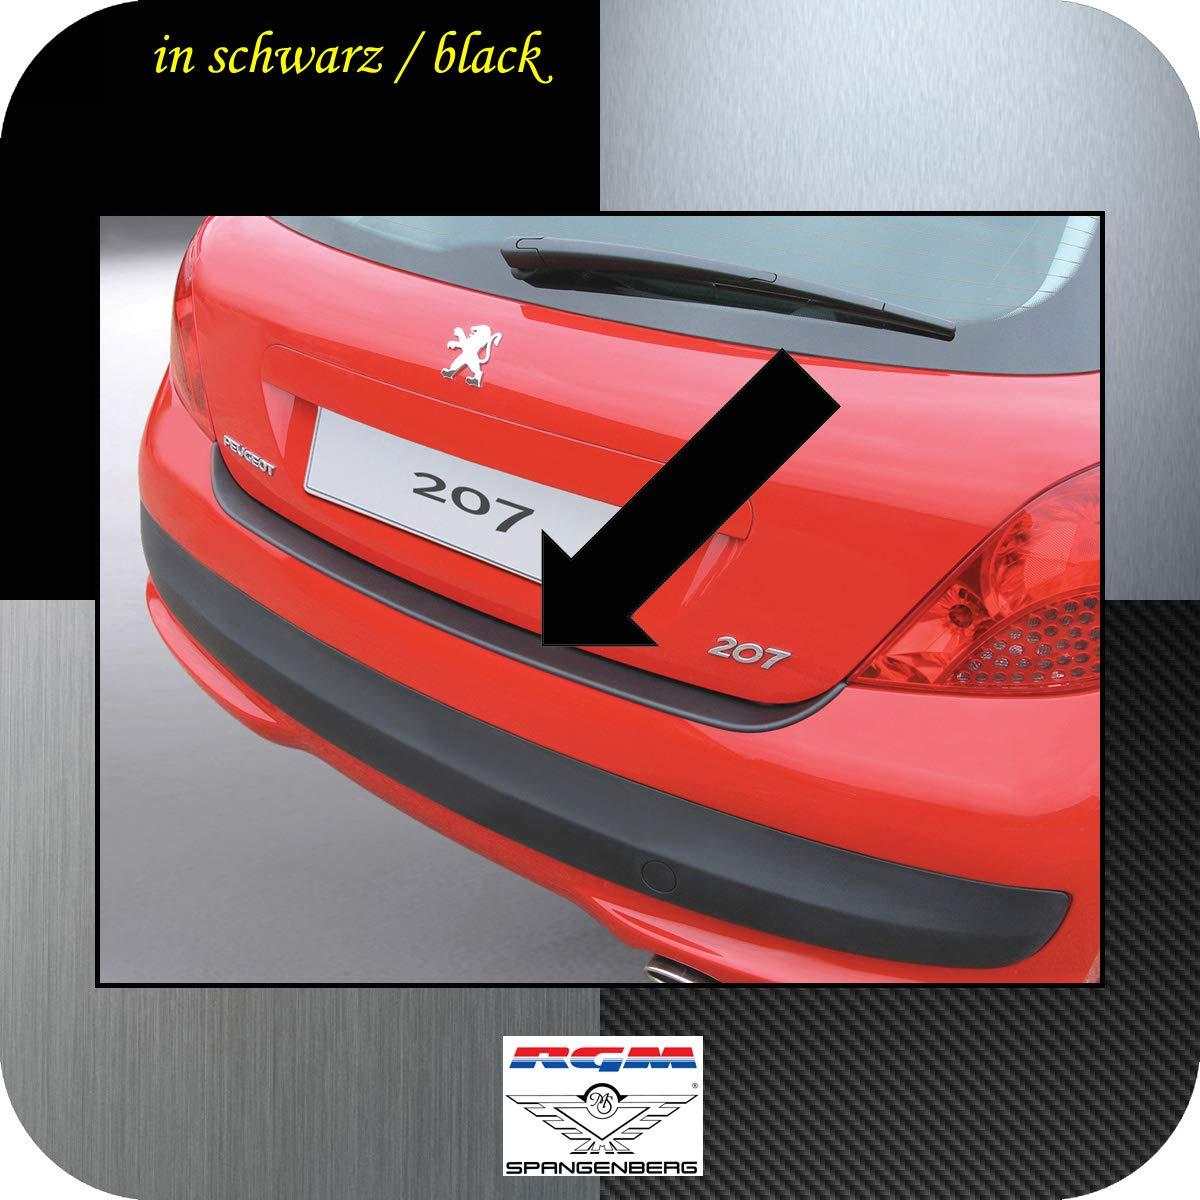 Richard Grant Mouldings Ltd. Original RGM ladekant Protección Negro para Peugeot 207 Hatchback de 3 y 5 Puertas (Modelos a Partir de año 02.2006 rbp292: ...